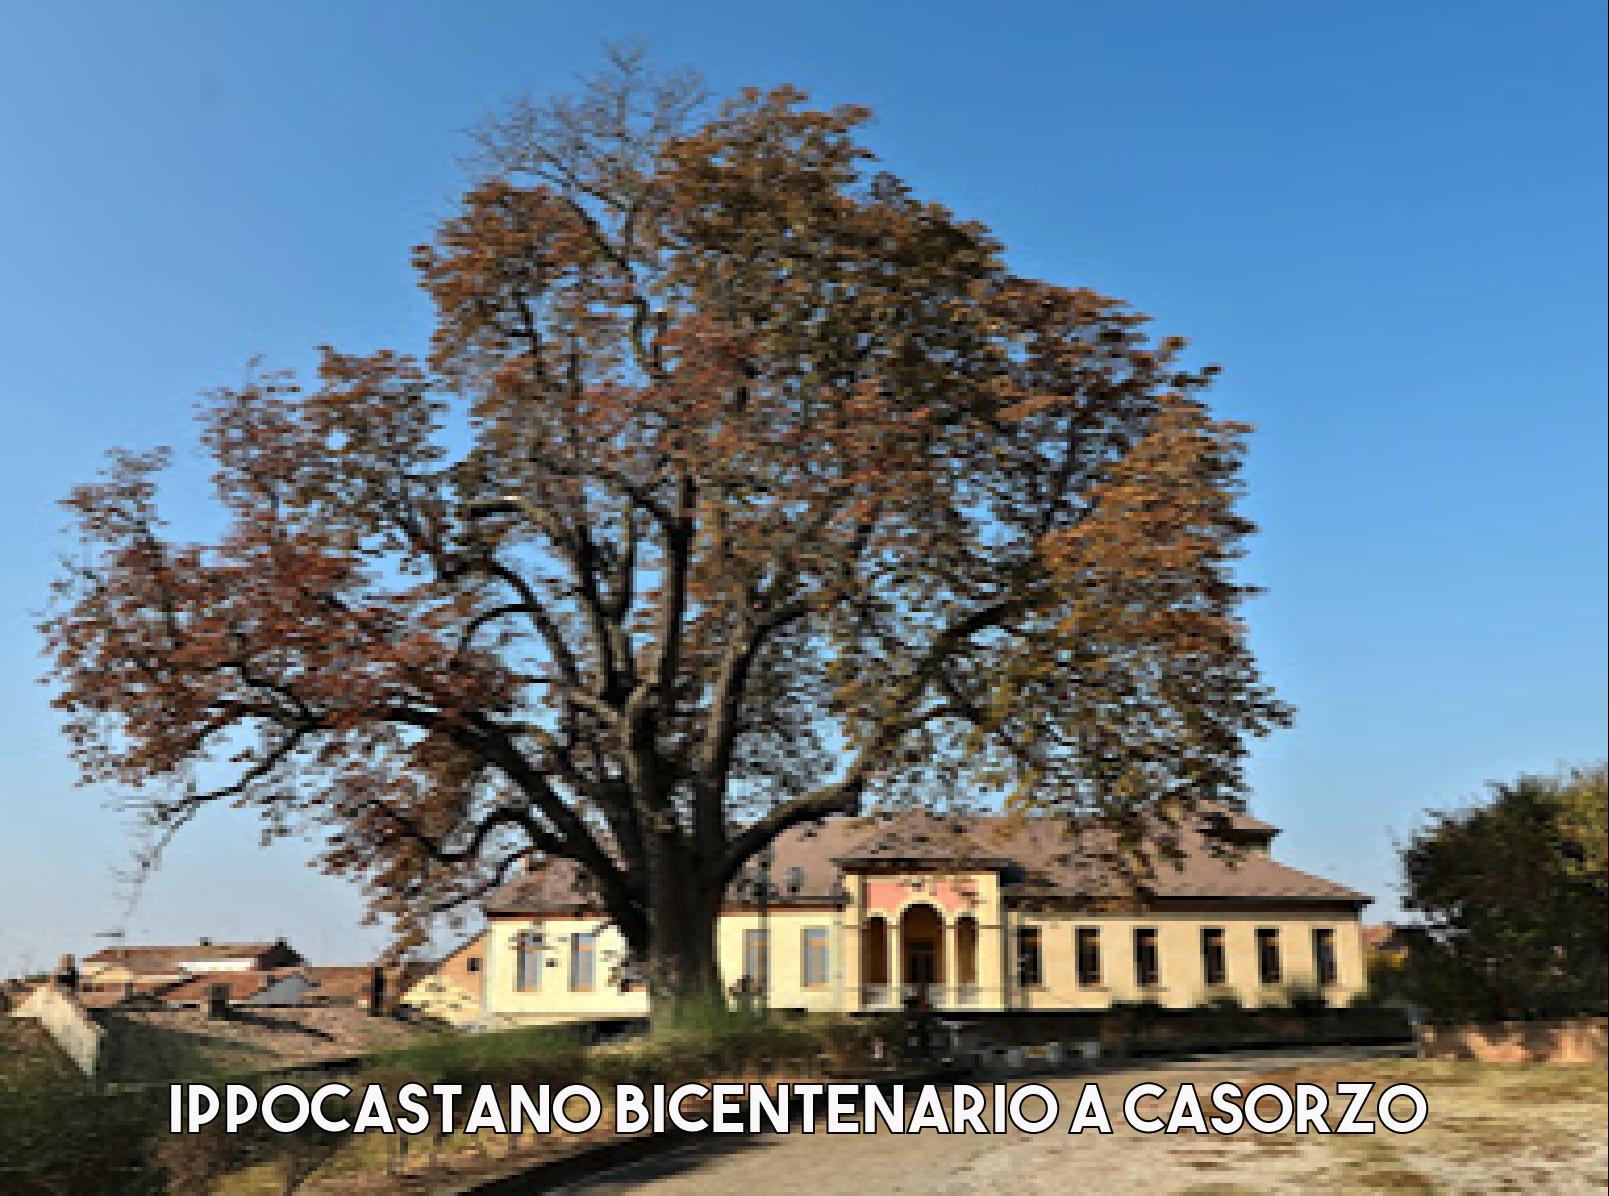 ippocasatanobicentenariocasorzo-1629885799.png